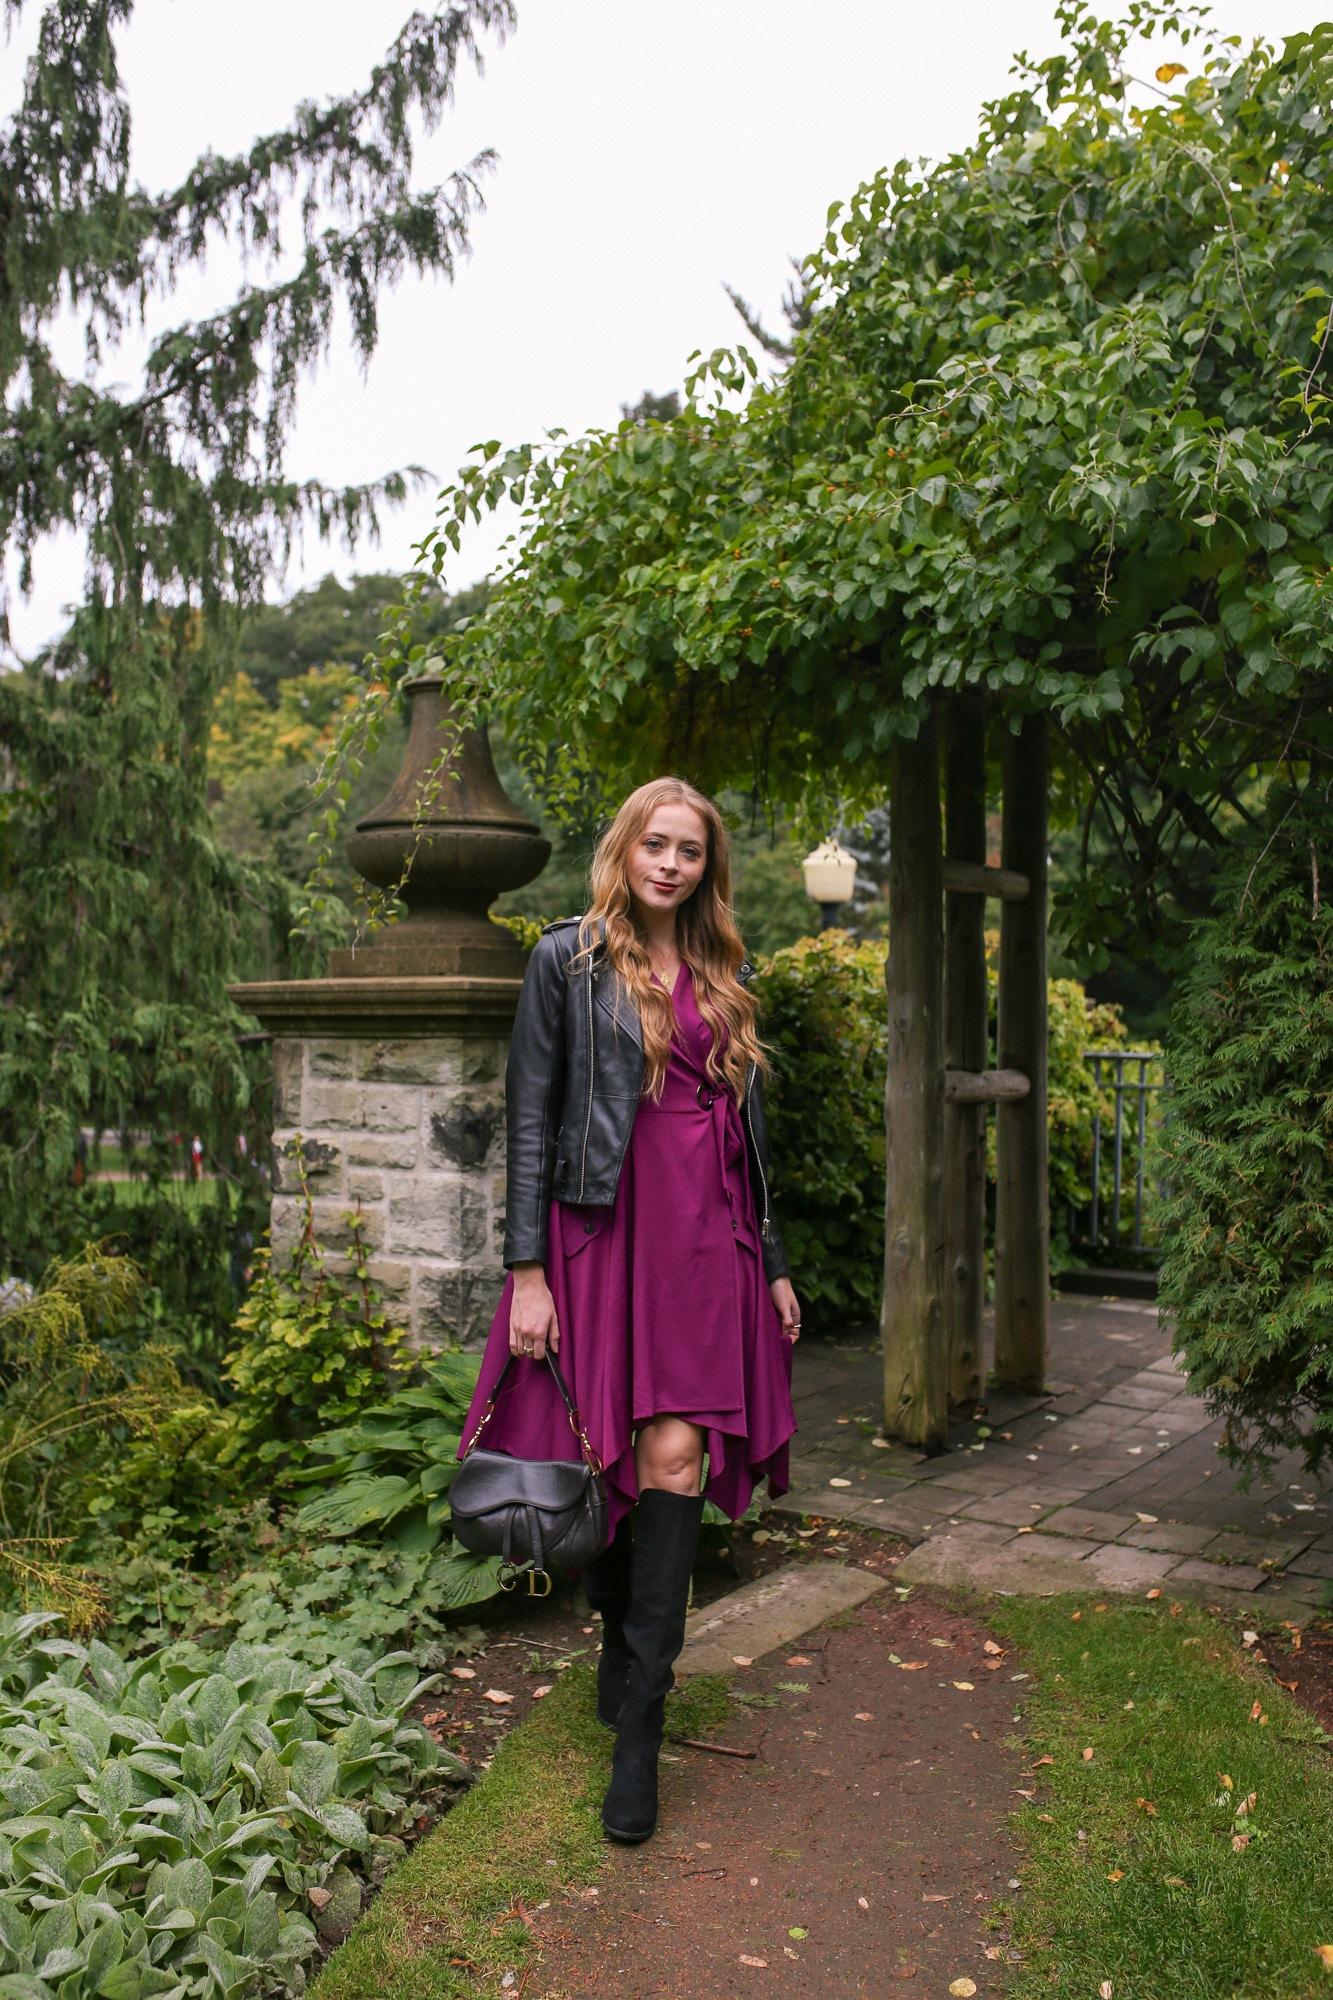 Leather jacket, Chriselle Lim collection dress and a vintage Dior saddle bag.